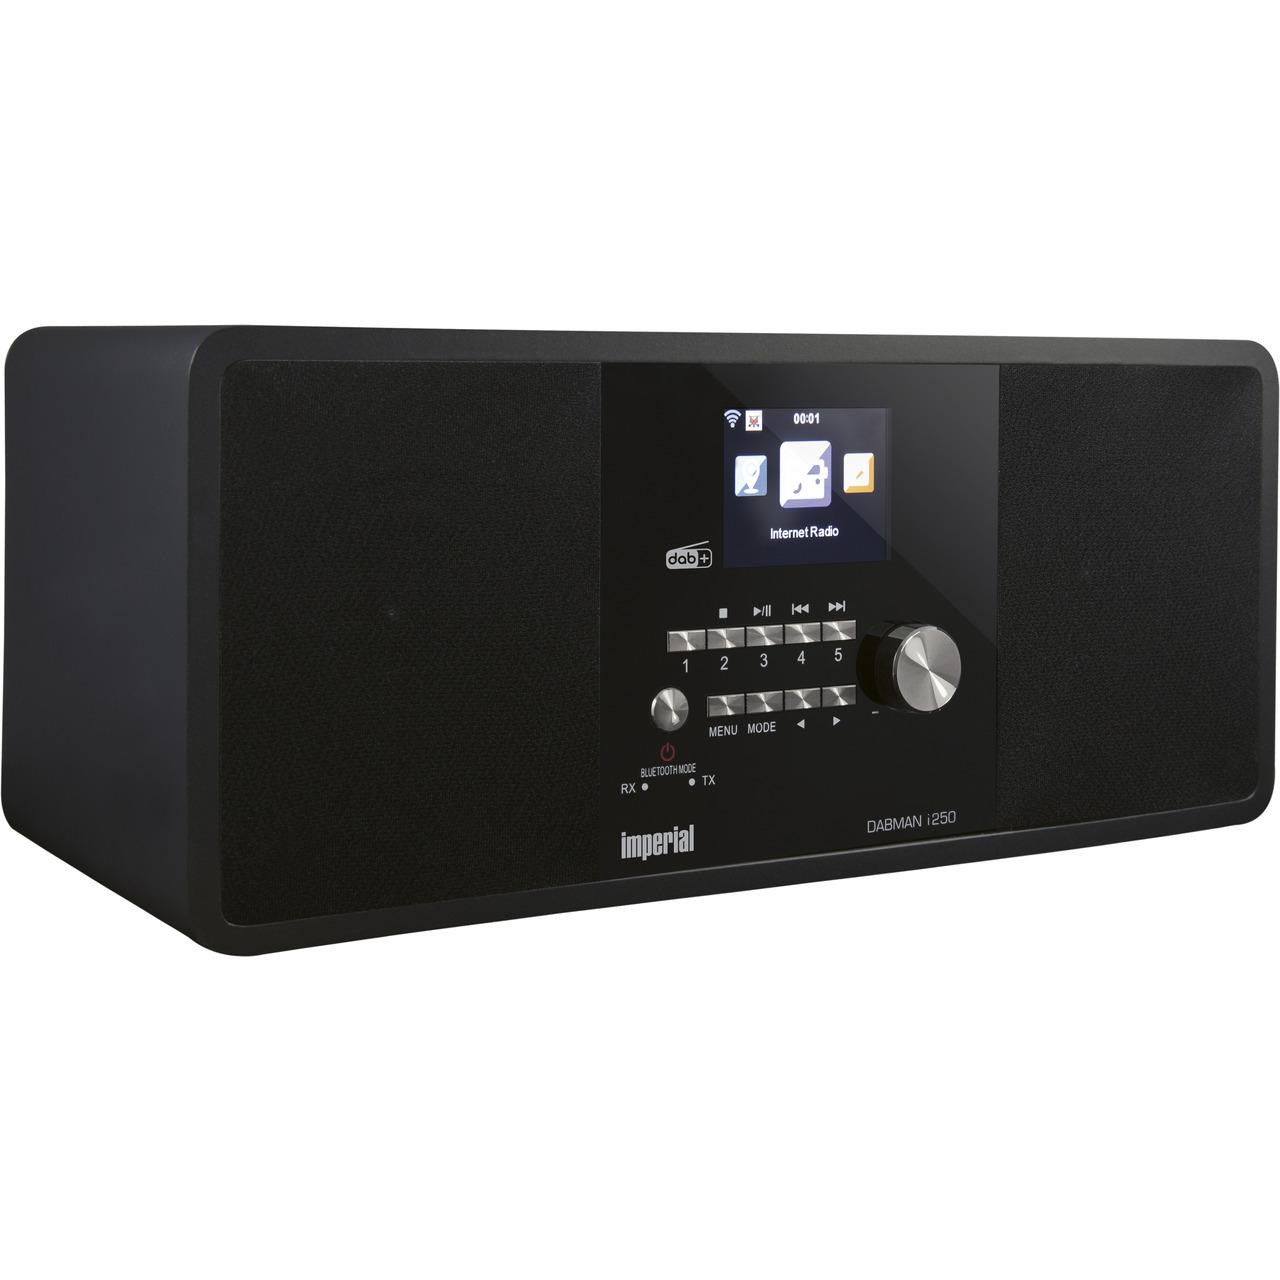 Imperial Hybridradio DABMAN i250- UKW-DAB+-Internetradio- Bluetooth-Sender-Empfänger- 20-W-RMS